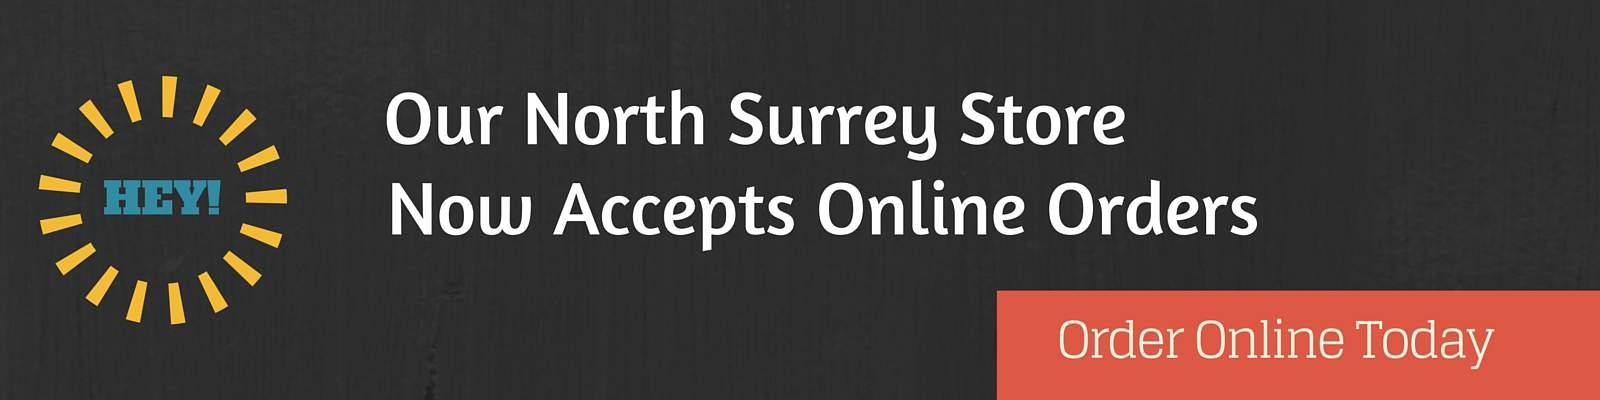 north surrey online ordering banner